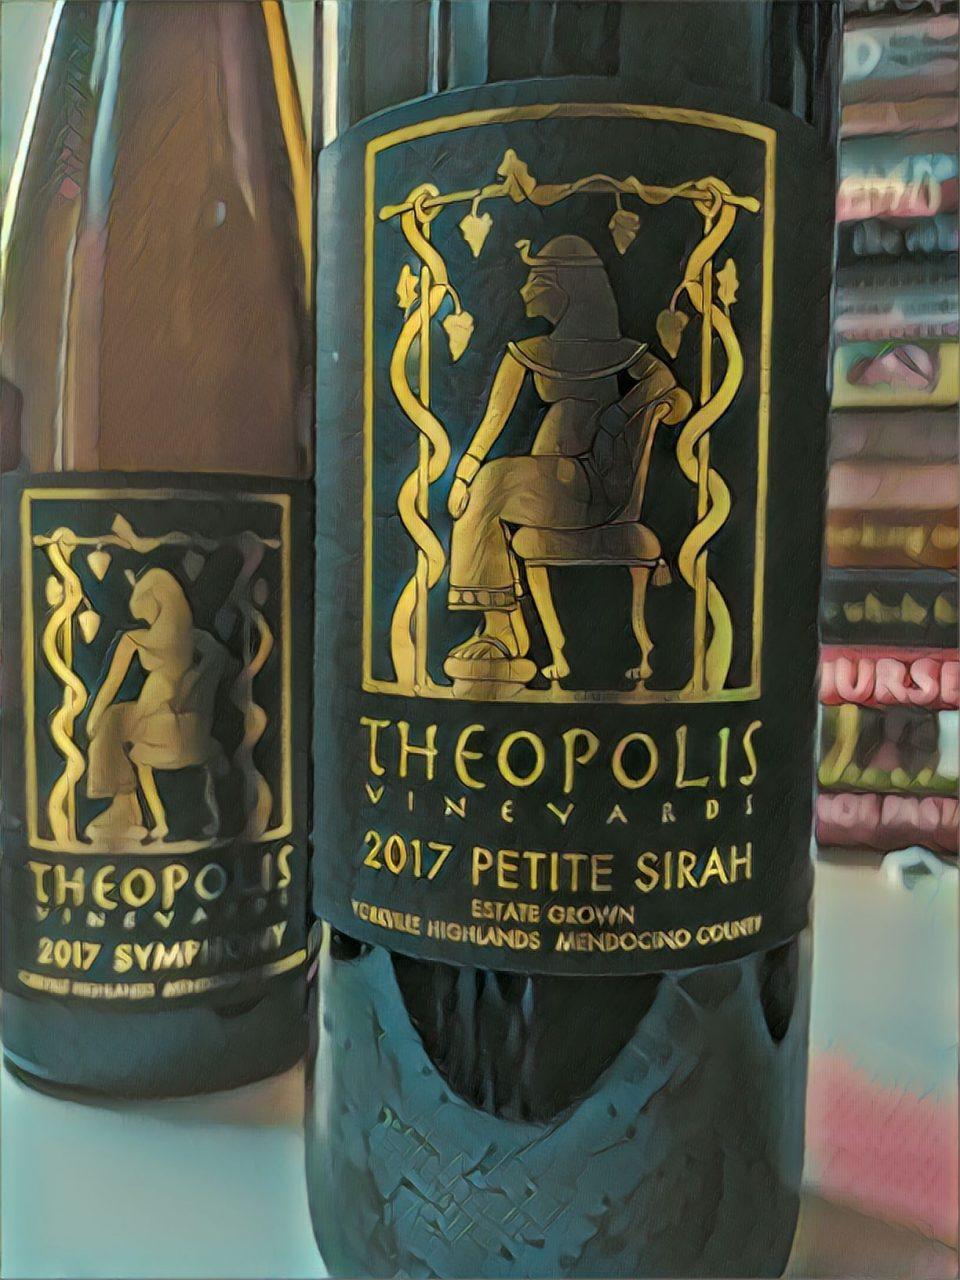 Theopolis Vineyards: A Magickal Boutique Vineyard in Yorkville Highlands